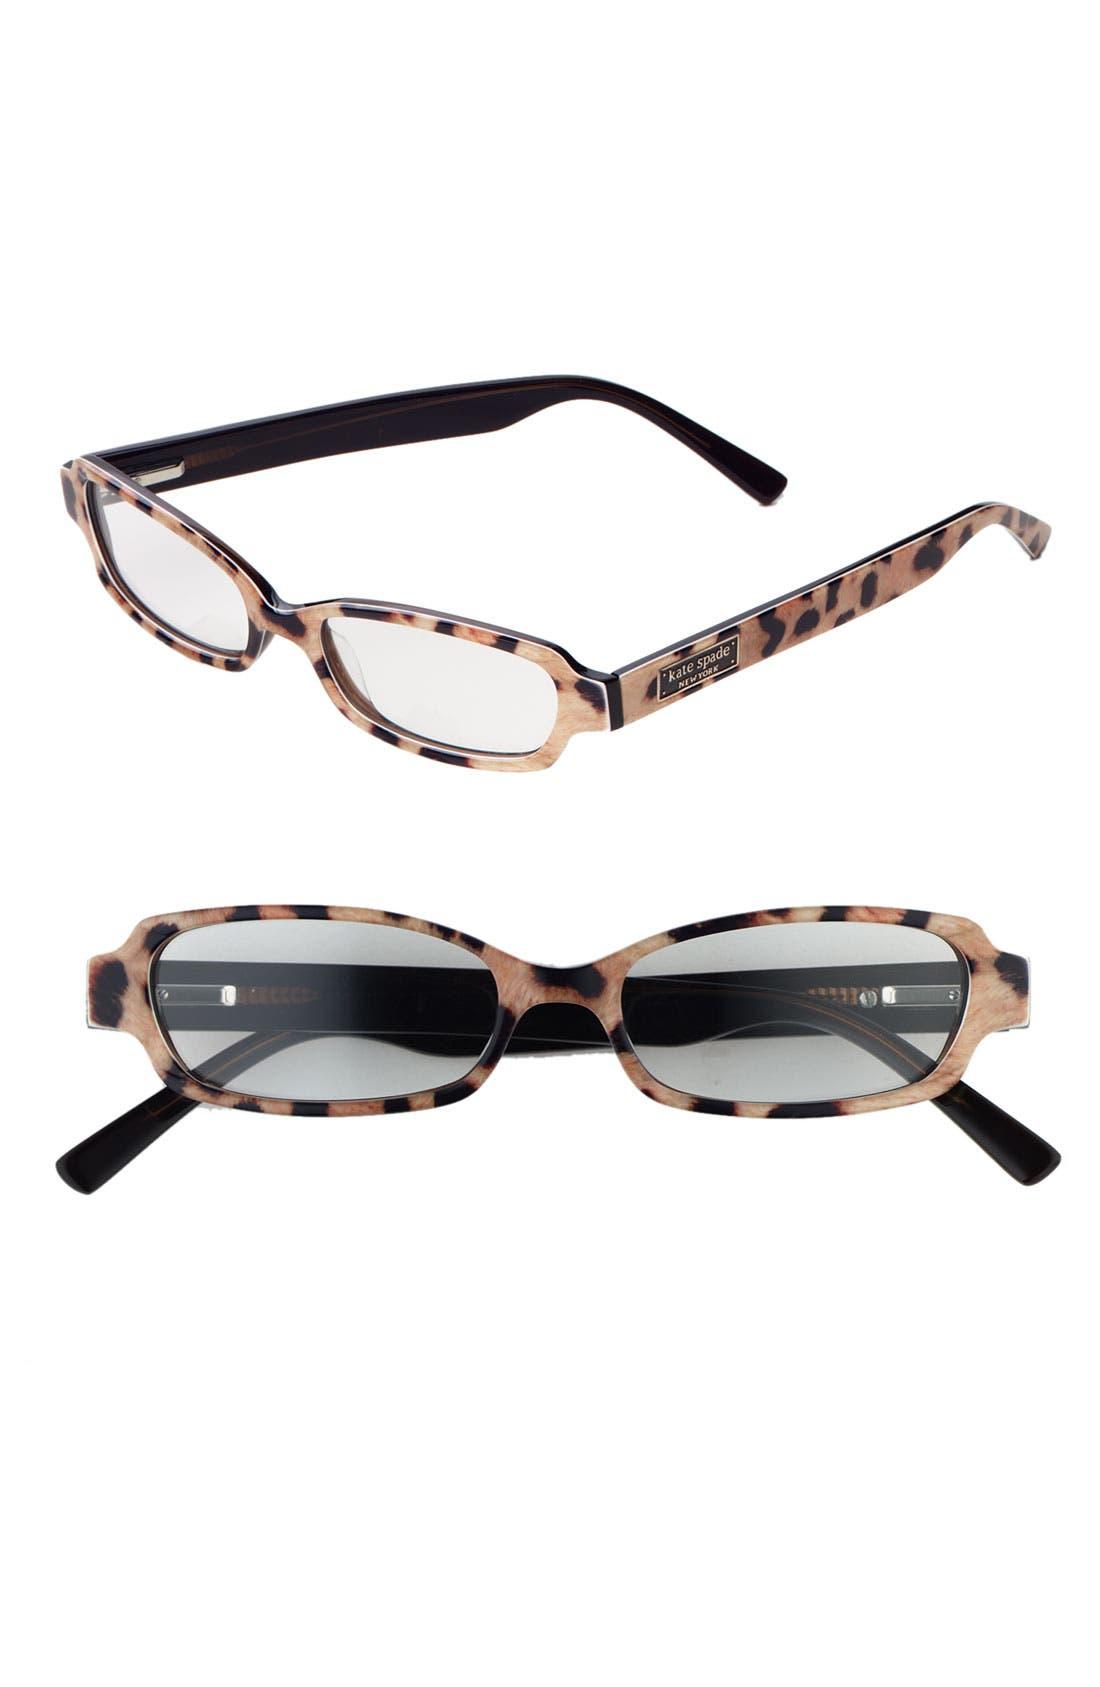 Alternate Image 1 Selected - kate spade new york 'millie' reading glasses